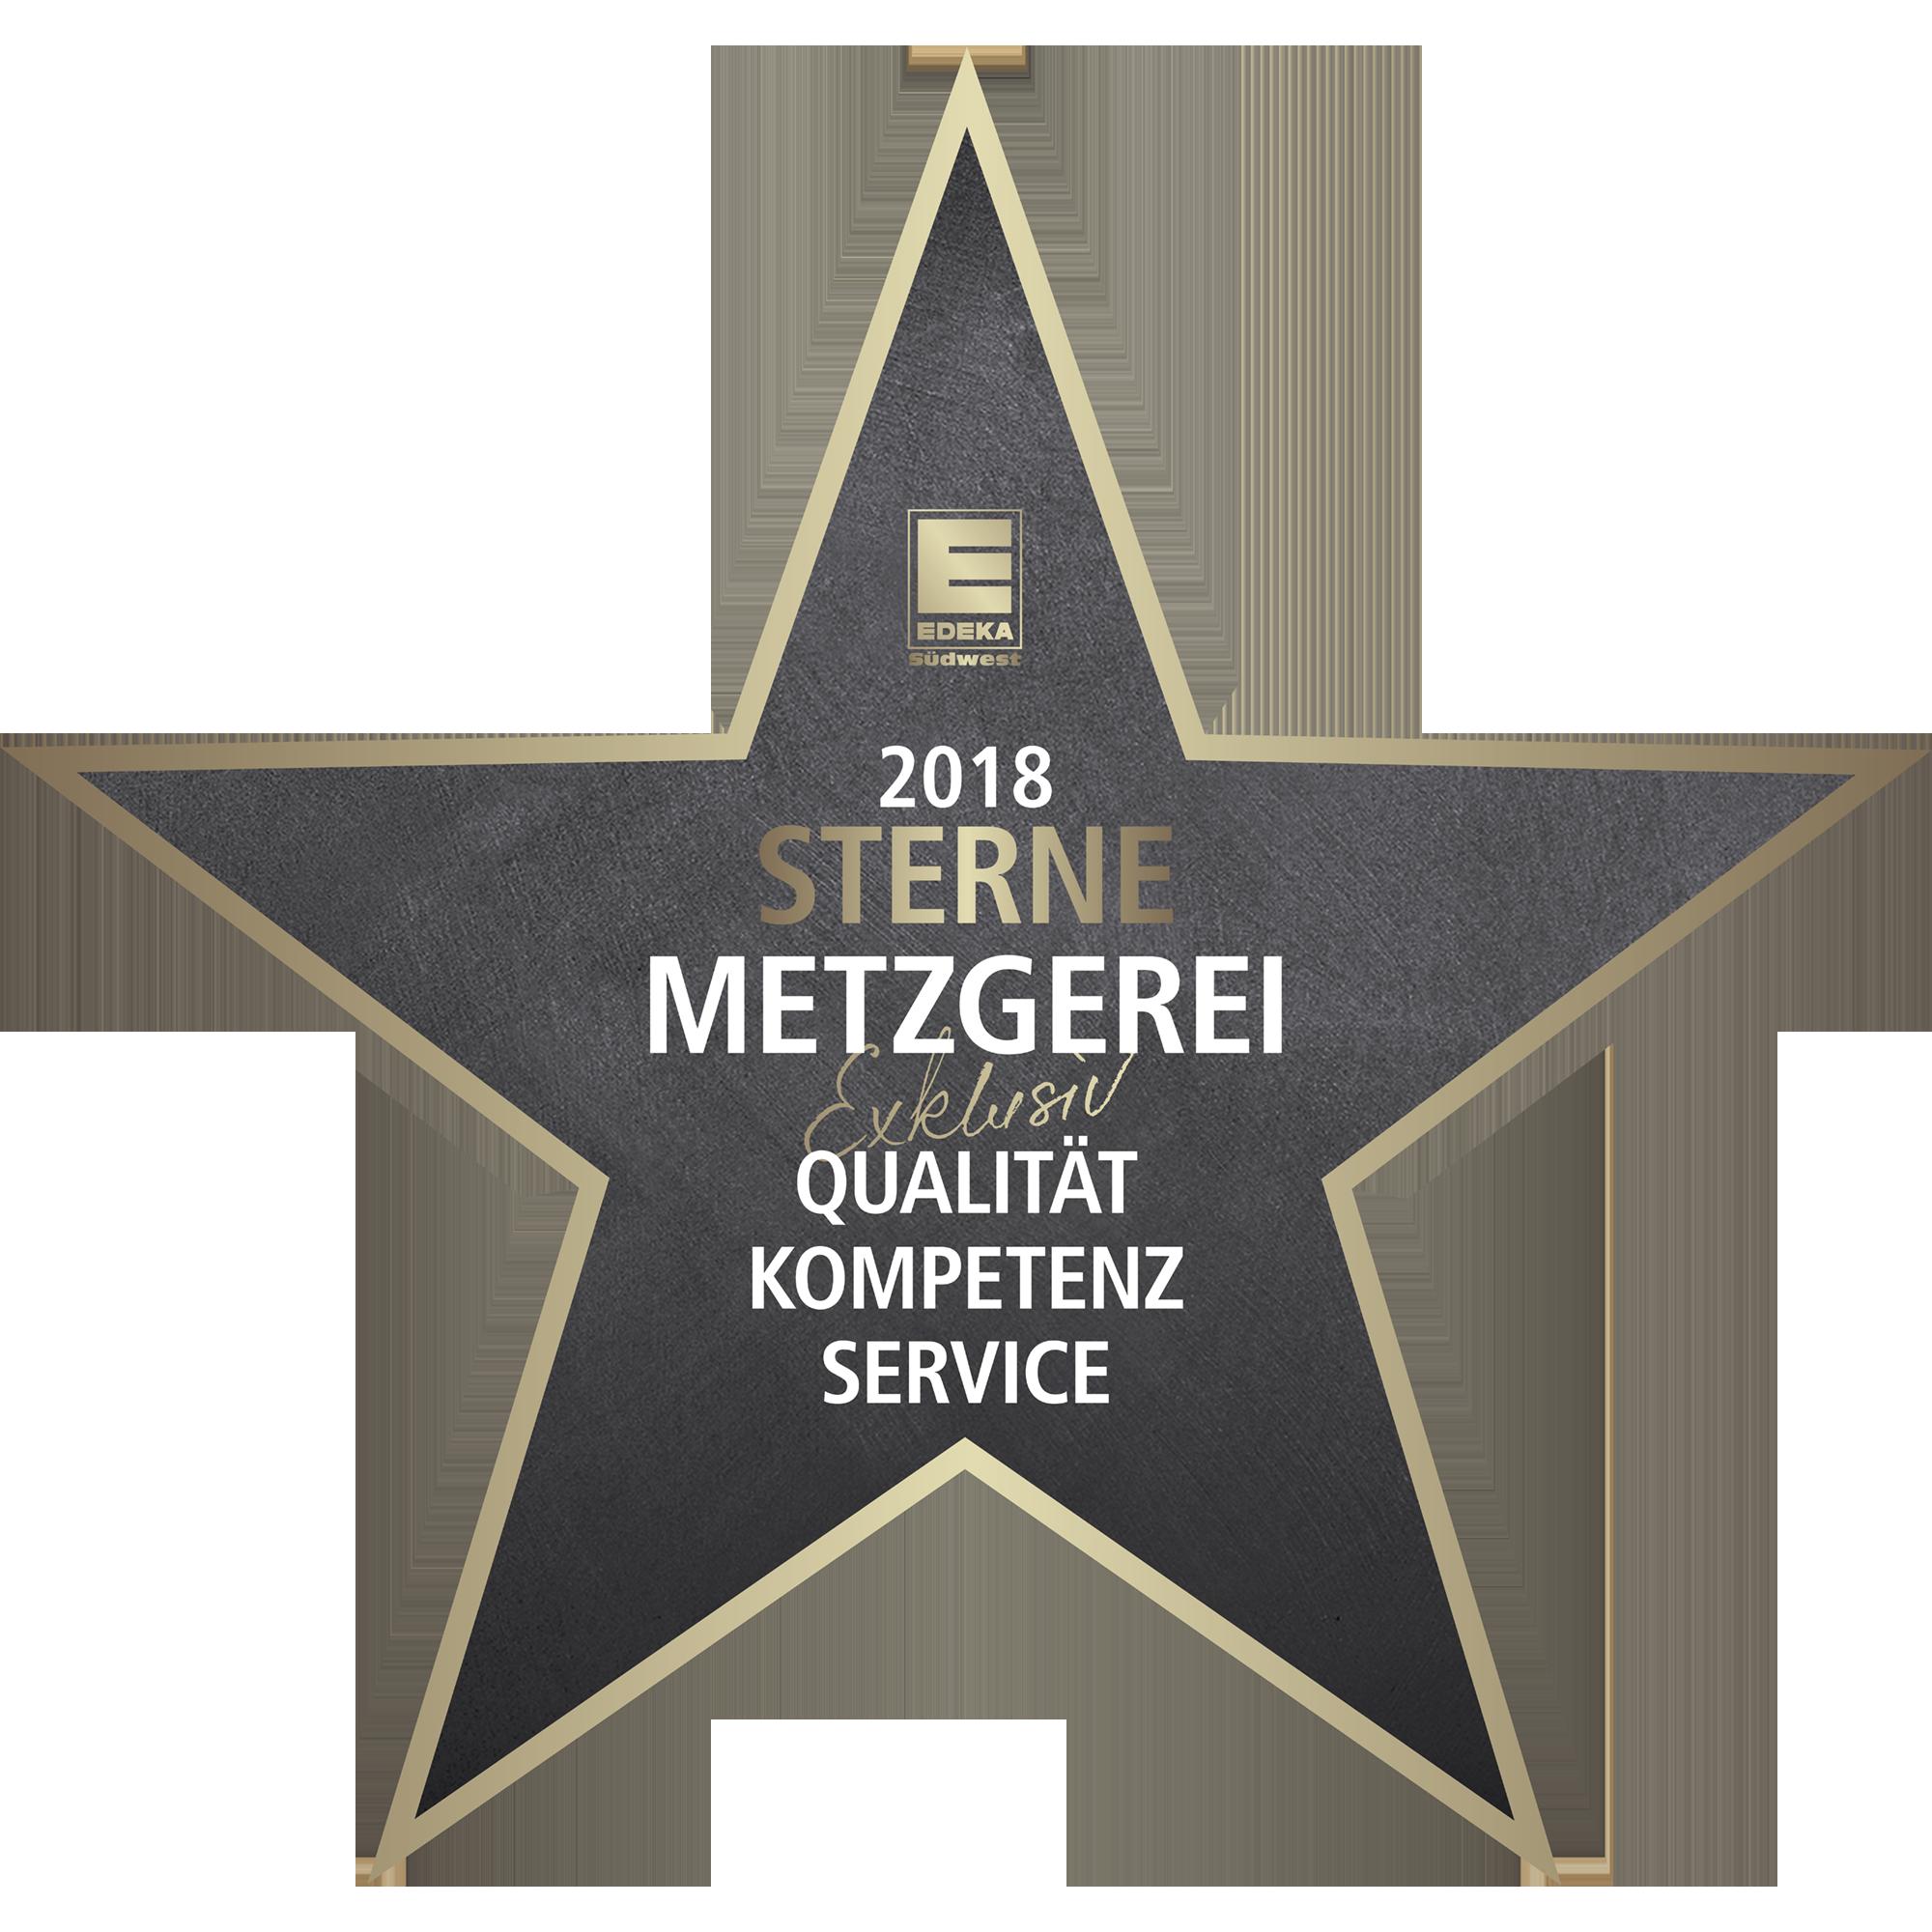 Stern_Sternemetzgerei_2018